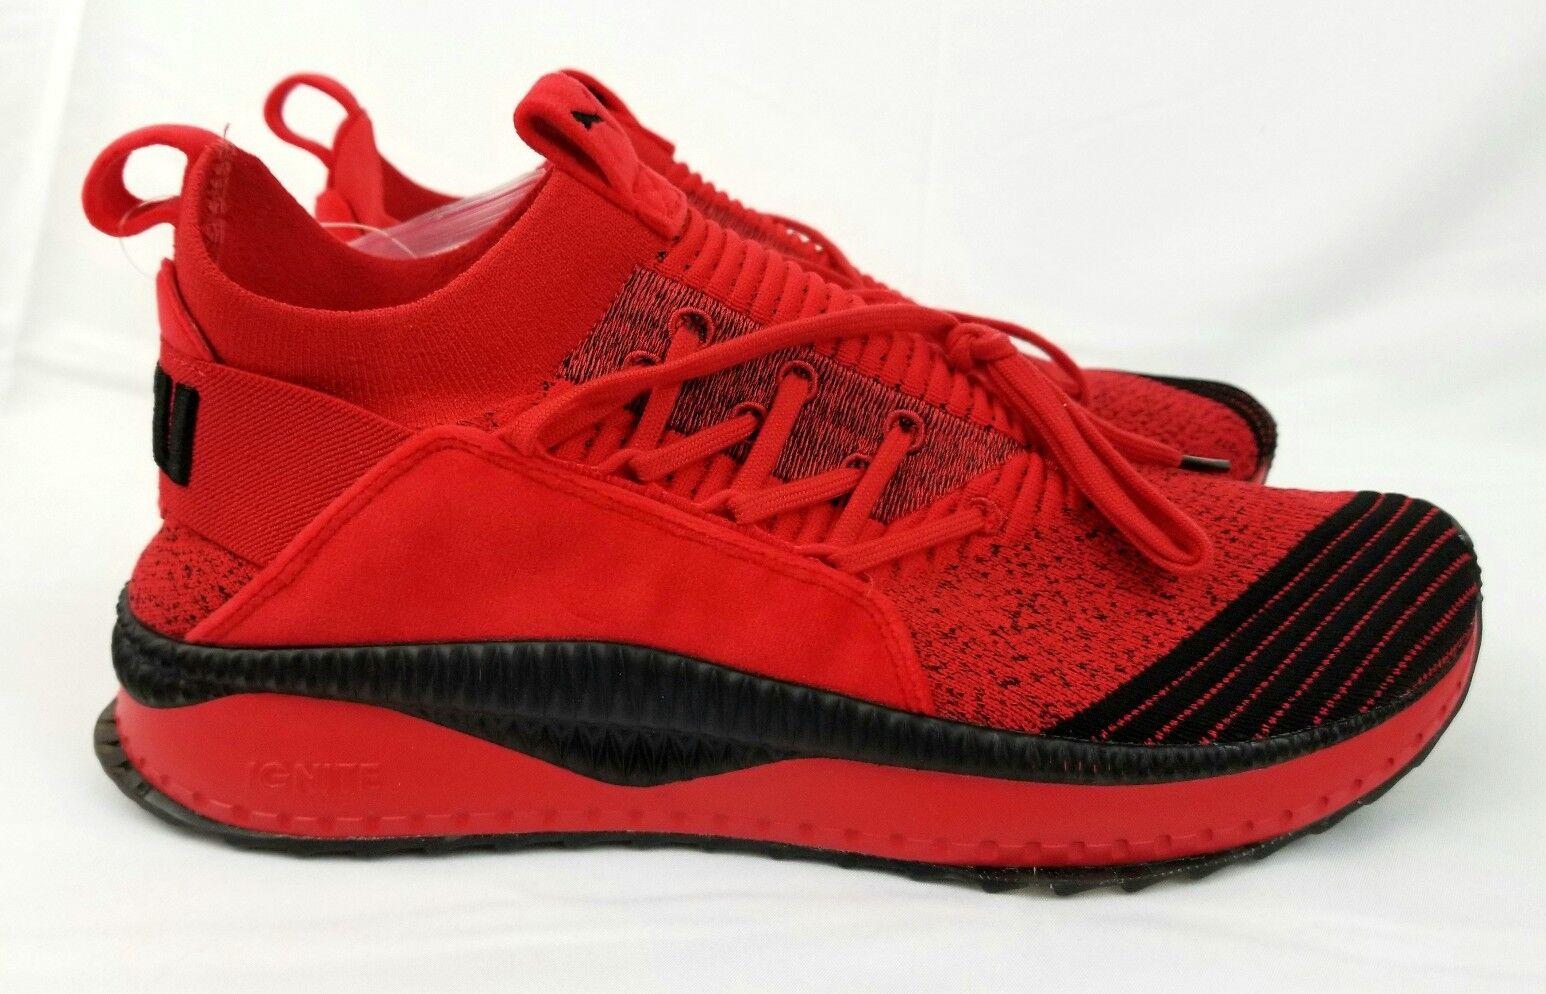 PUMA TSUGI JUN FUBU Men's Sz 12 High Risk Running shoes 366320 02 Red & Black